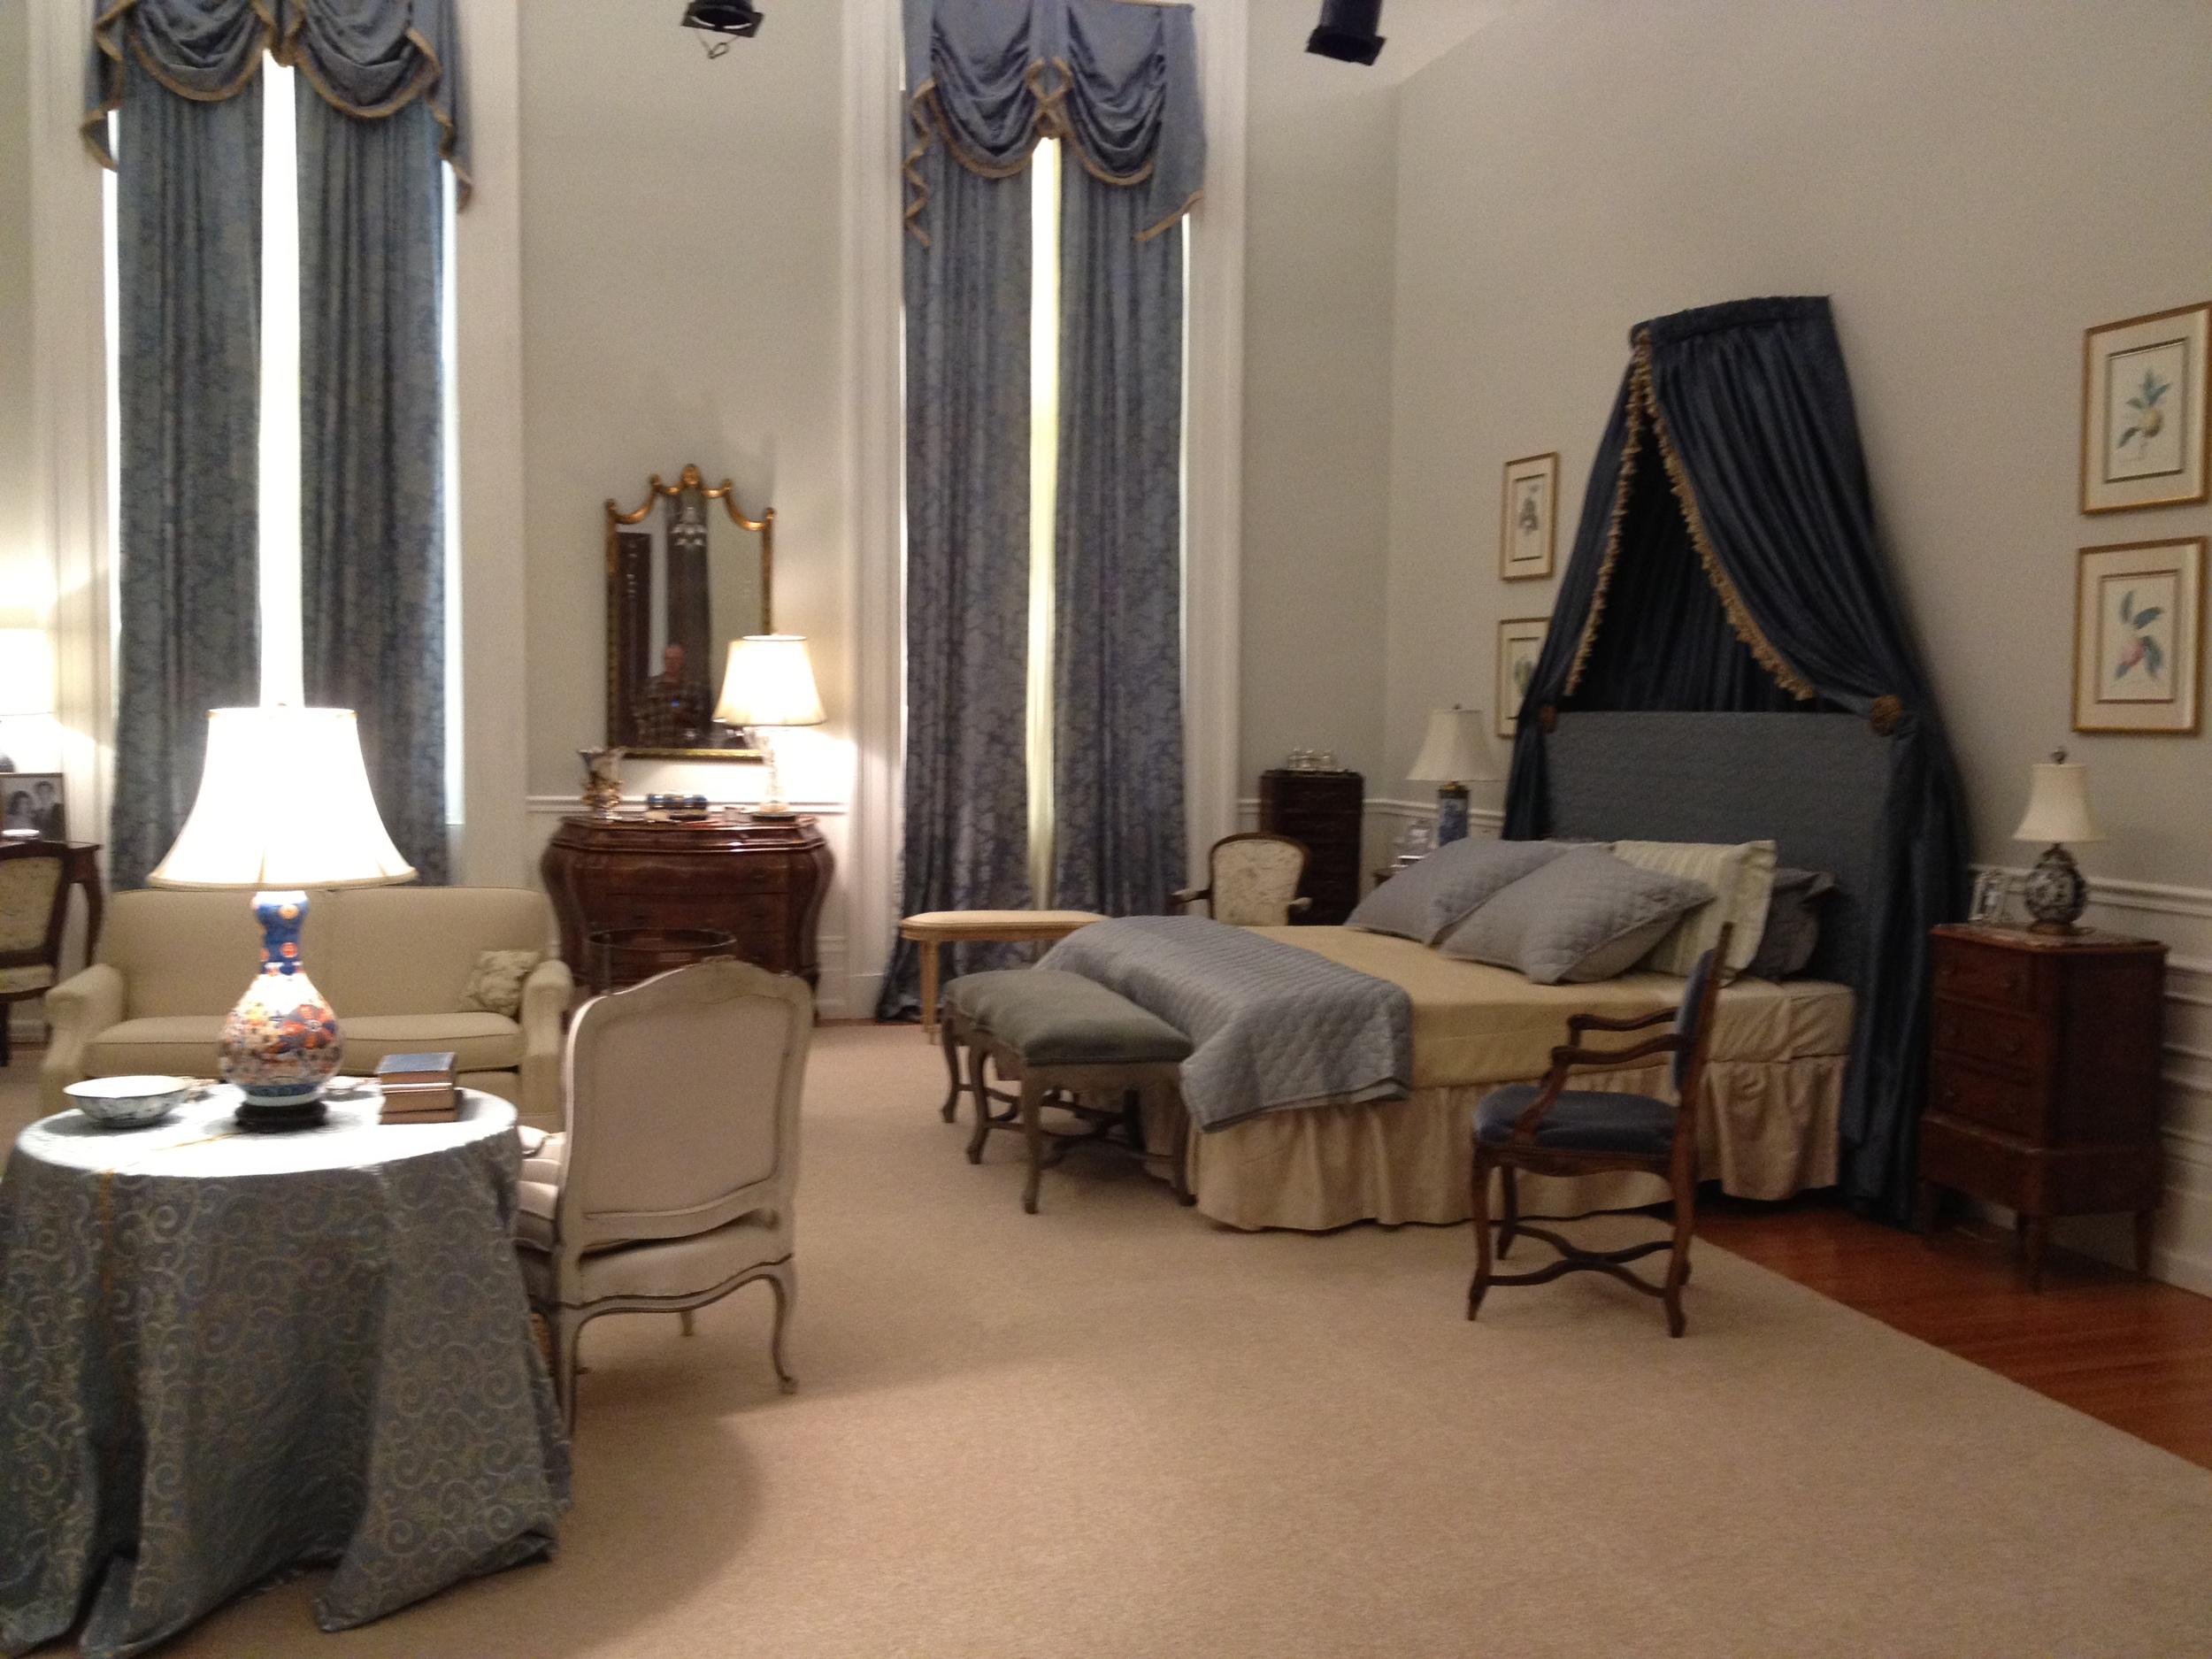 48 jfk bedroom.JPG